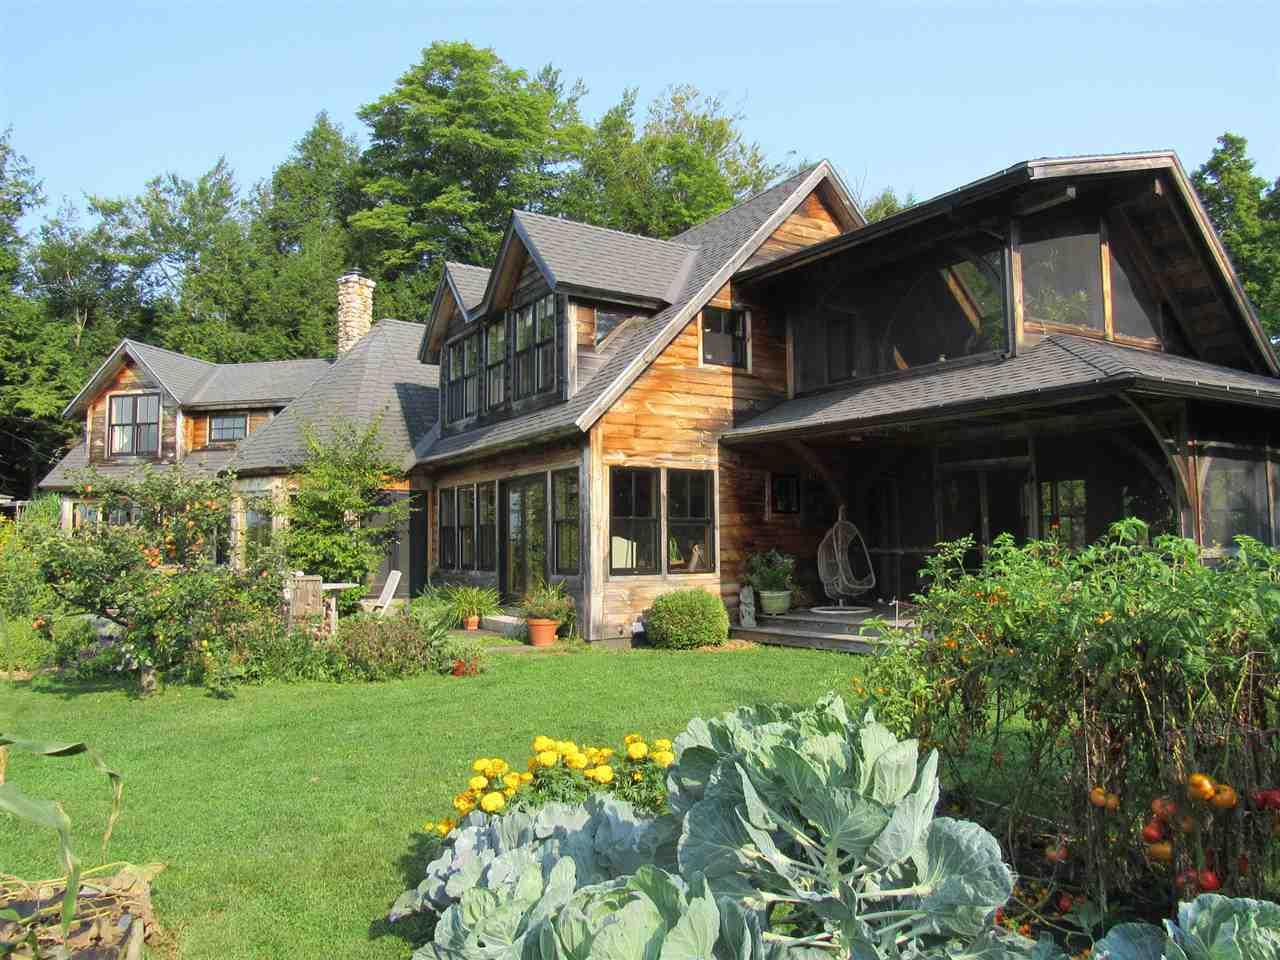 Mount-Snow-Real-Estate-4634670-6